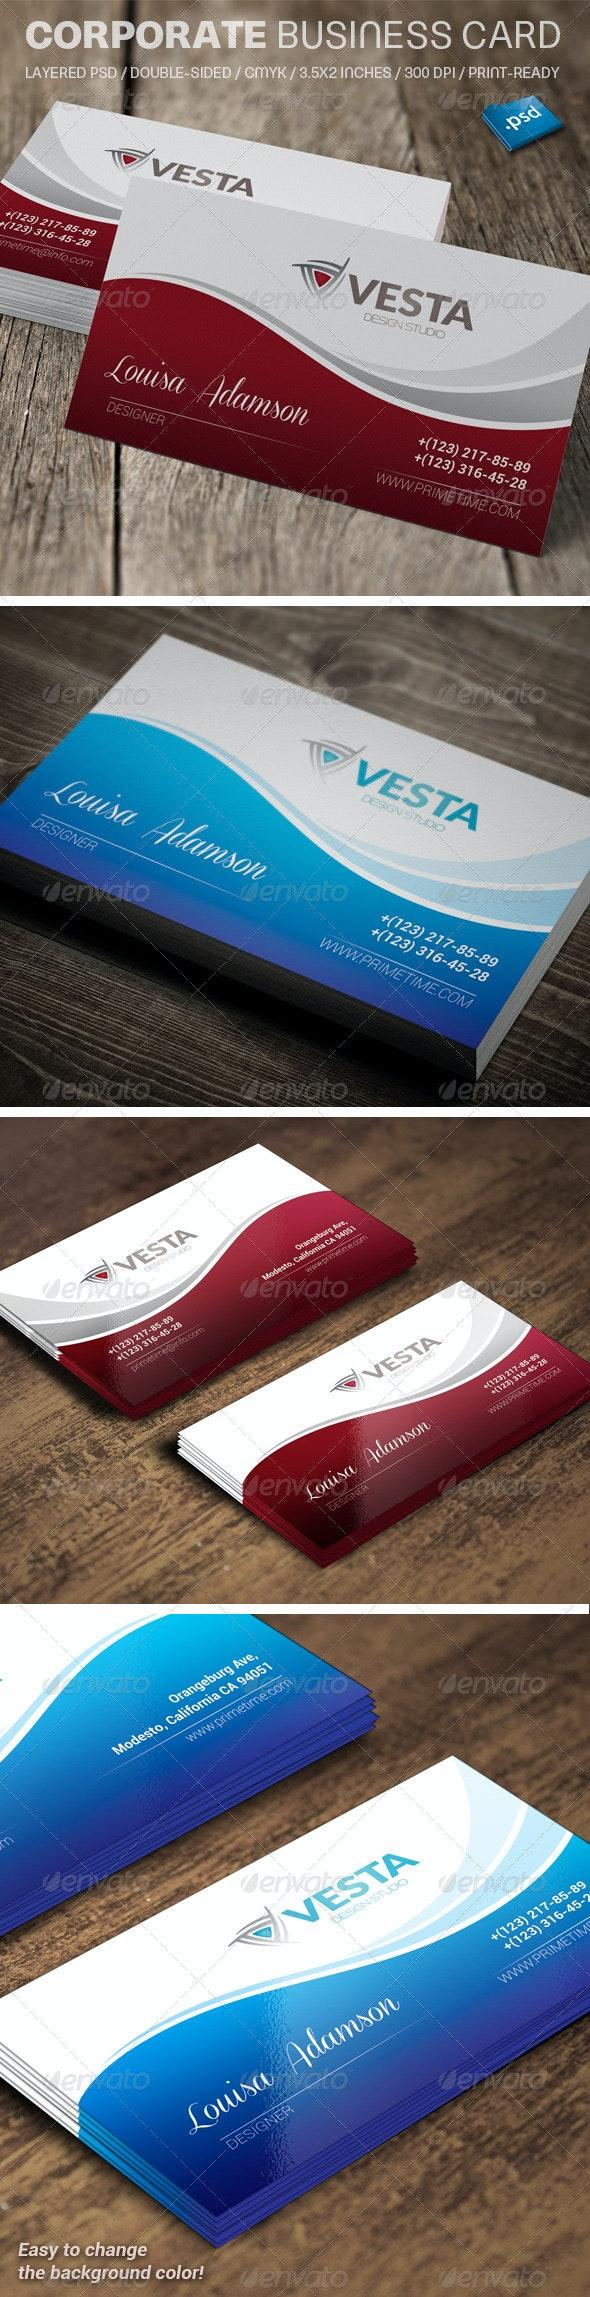 Corporate Business Card V720 - Corporate Business Cards